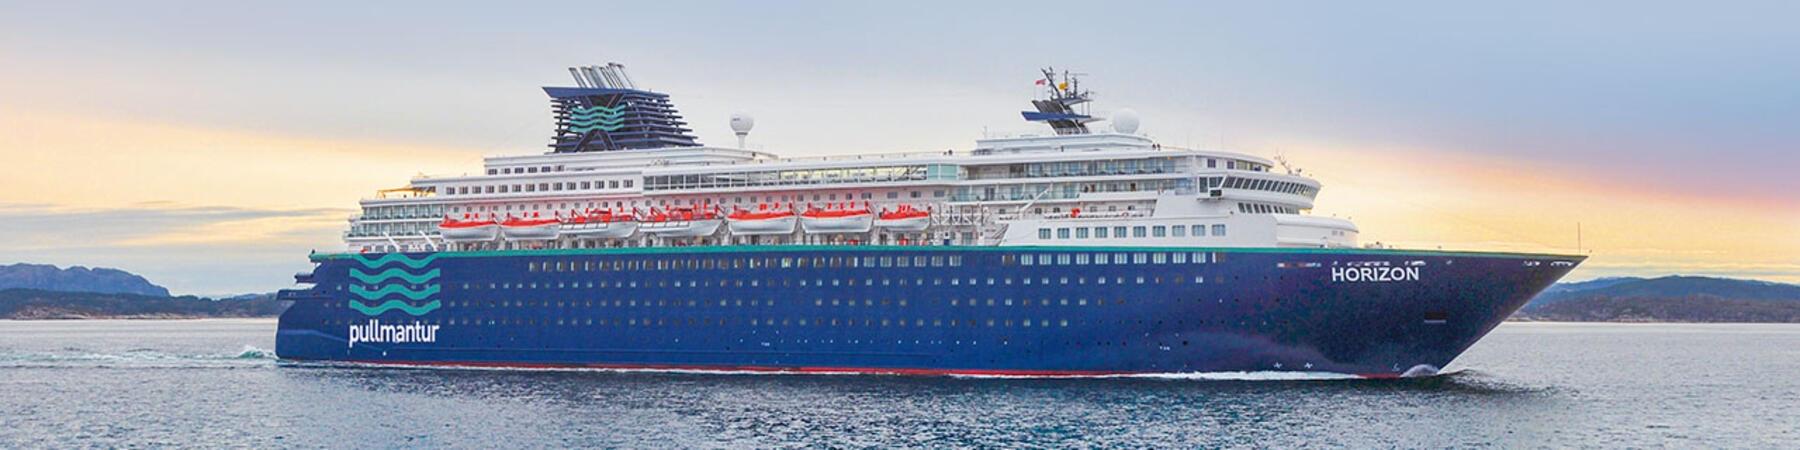 Pullmantur Horizon Cruise - Ship Review - Photos & Departure Ports on  Cruise Critic